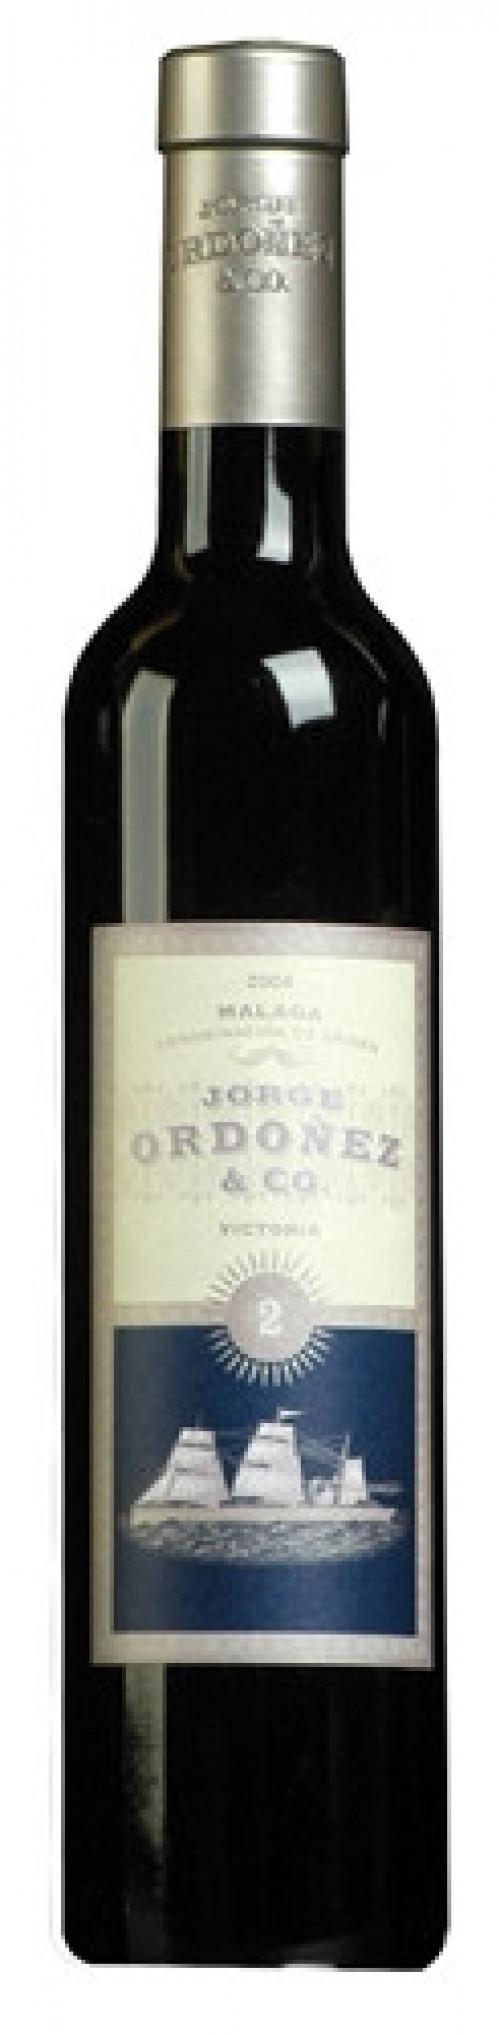 Jorge Ordonez Victoria #2 375ml